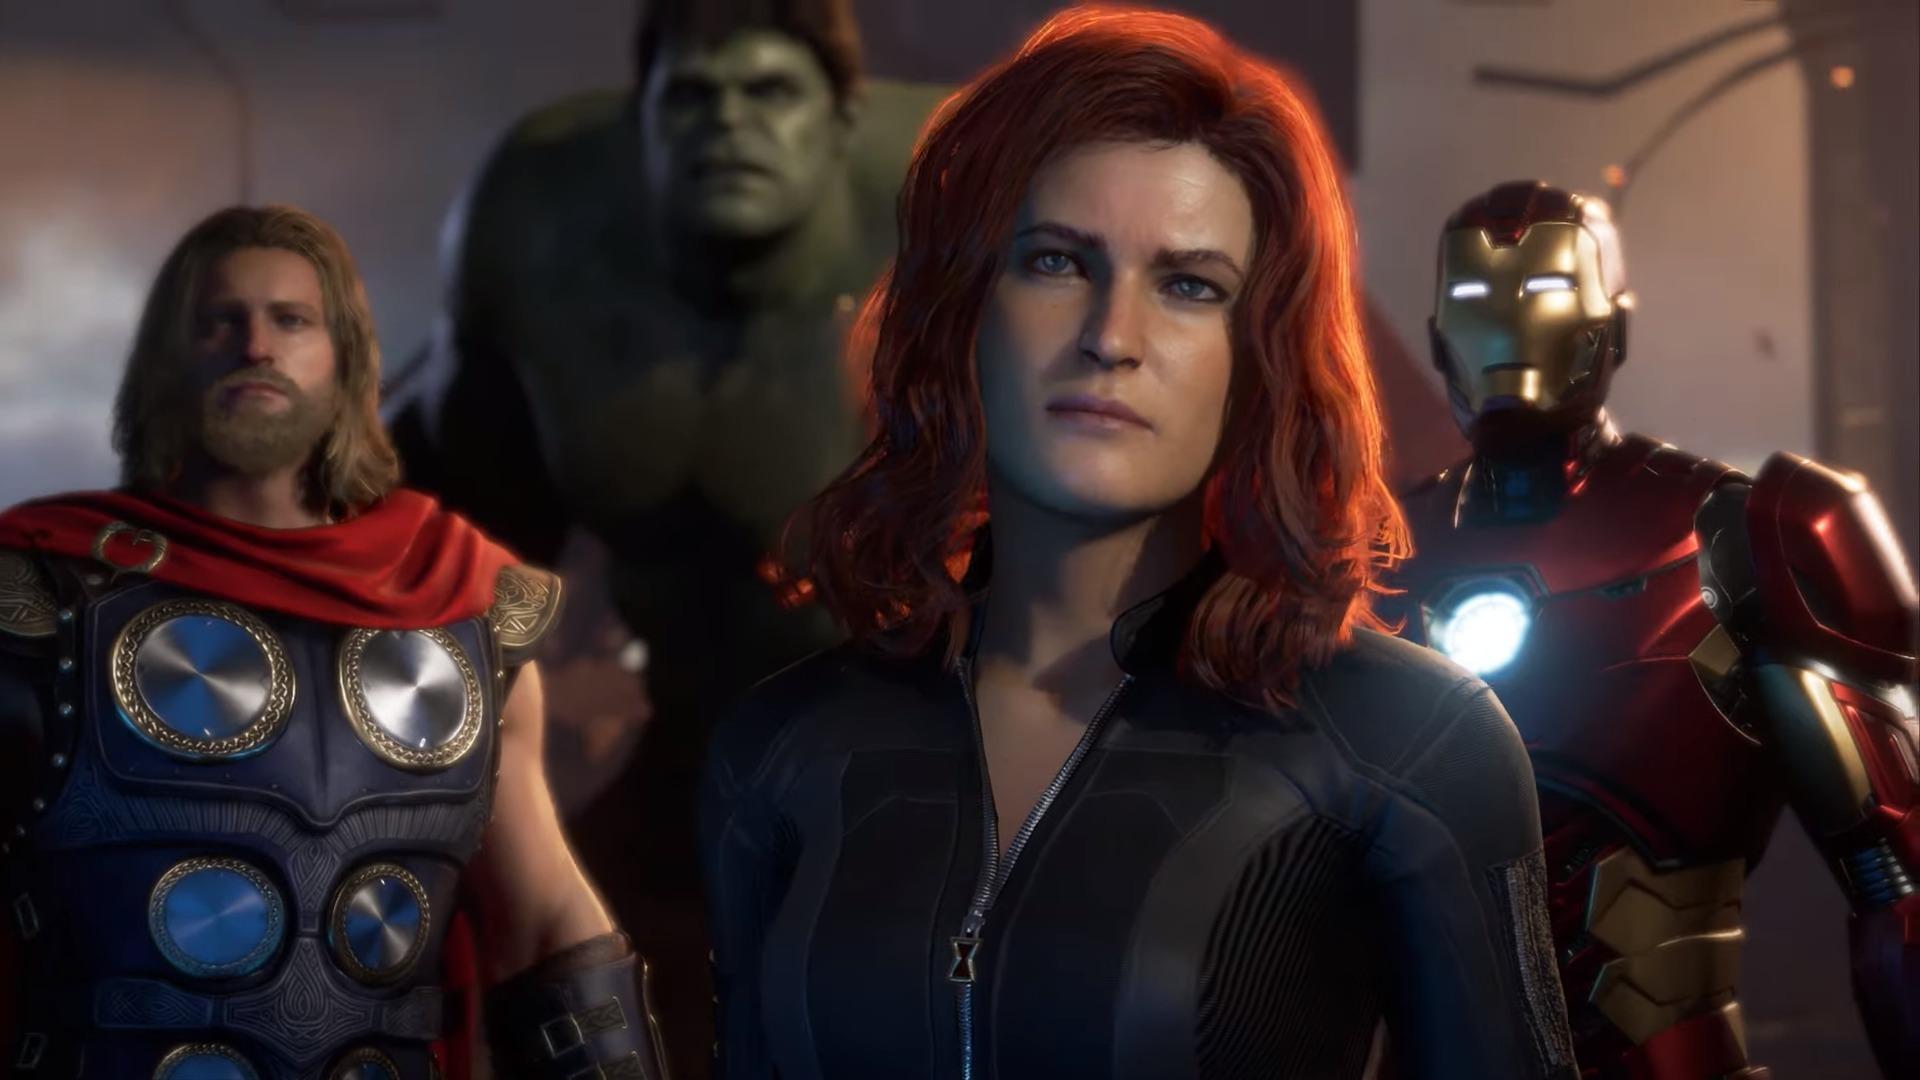 Marvel's Avengers cierra sorpresivamente la conferencia de Square Enix con un inesperado detalle #E32019